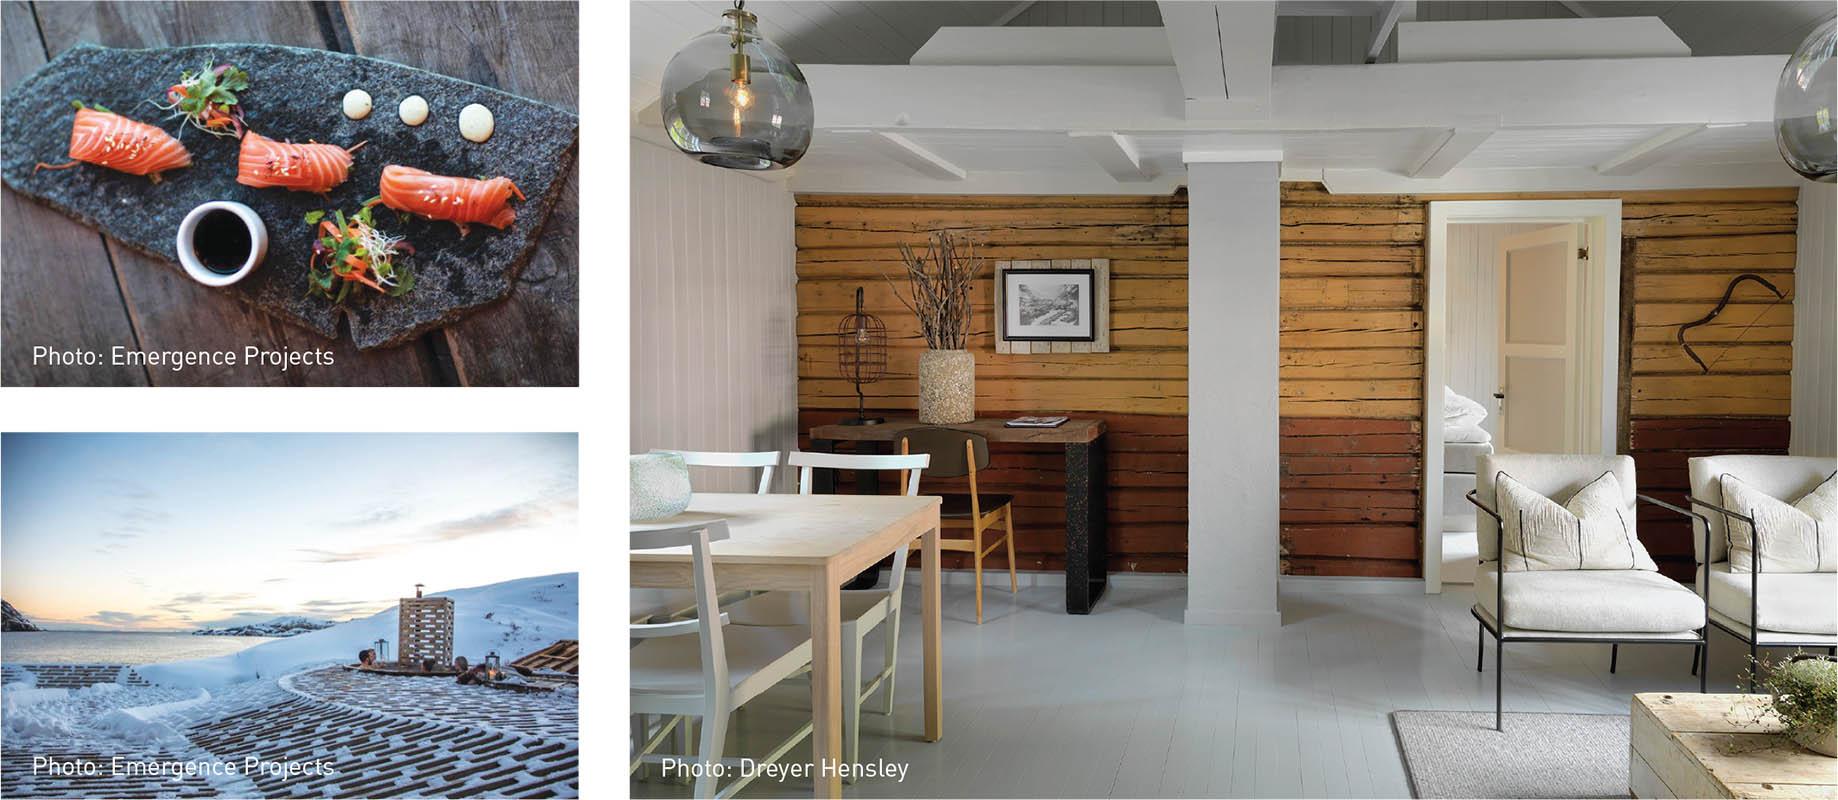 Nusfjord Arctic Resort, Recharge and explore, Scan Magazine